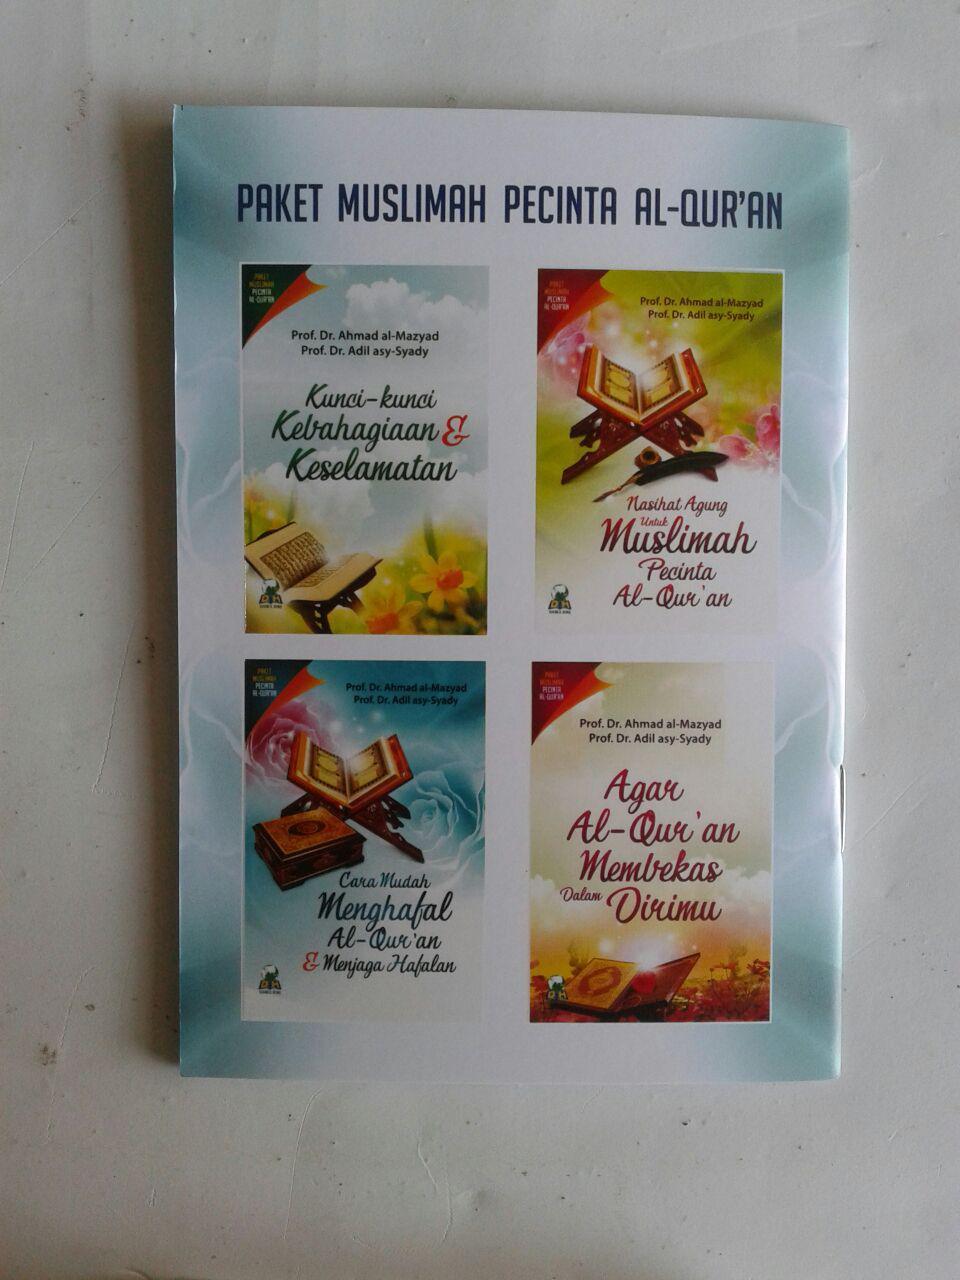 Paket Buku Muslimah Pecinta Al-Qur'an cover 2